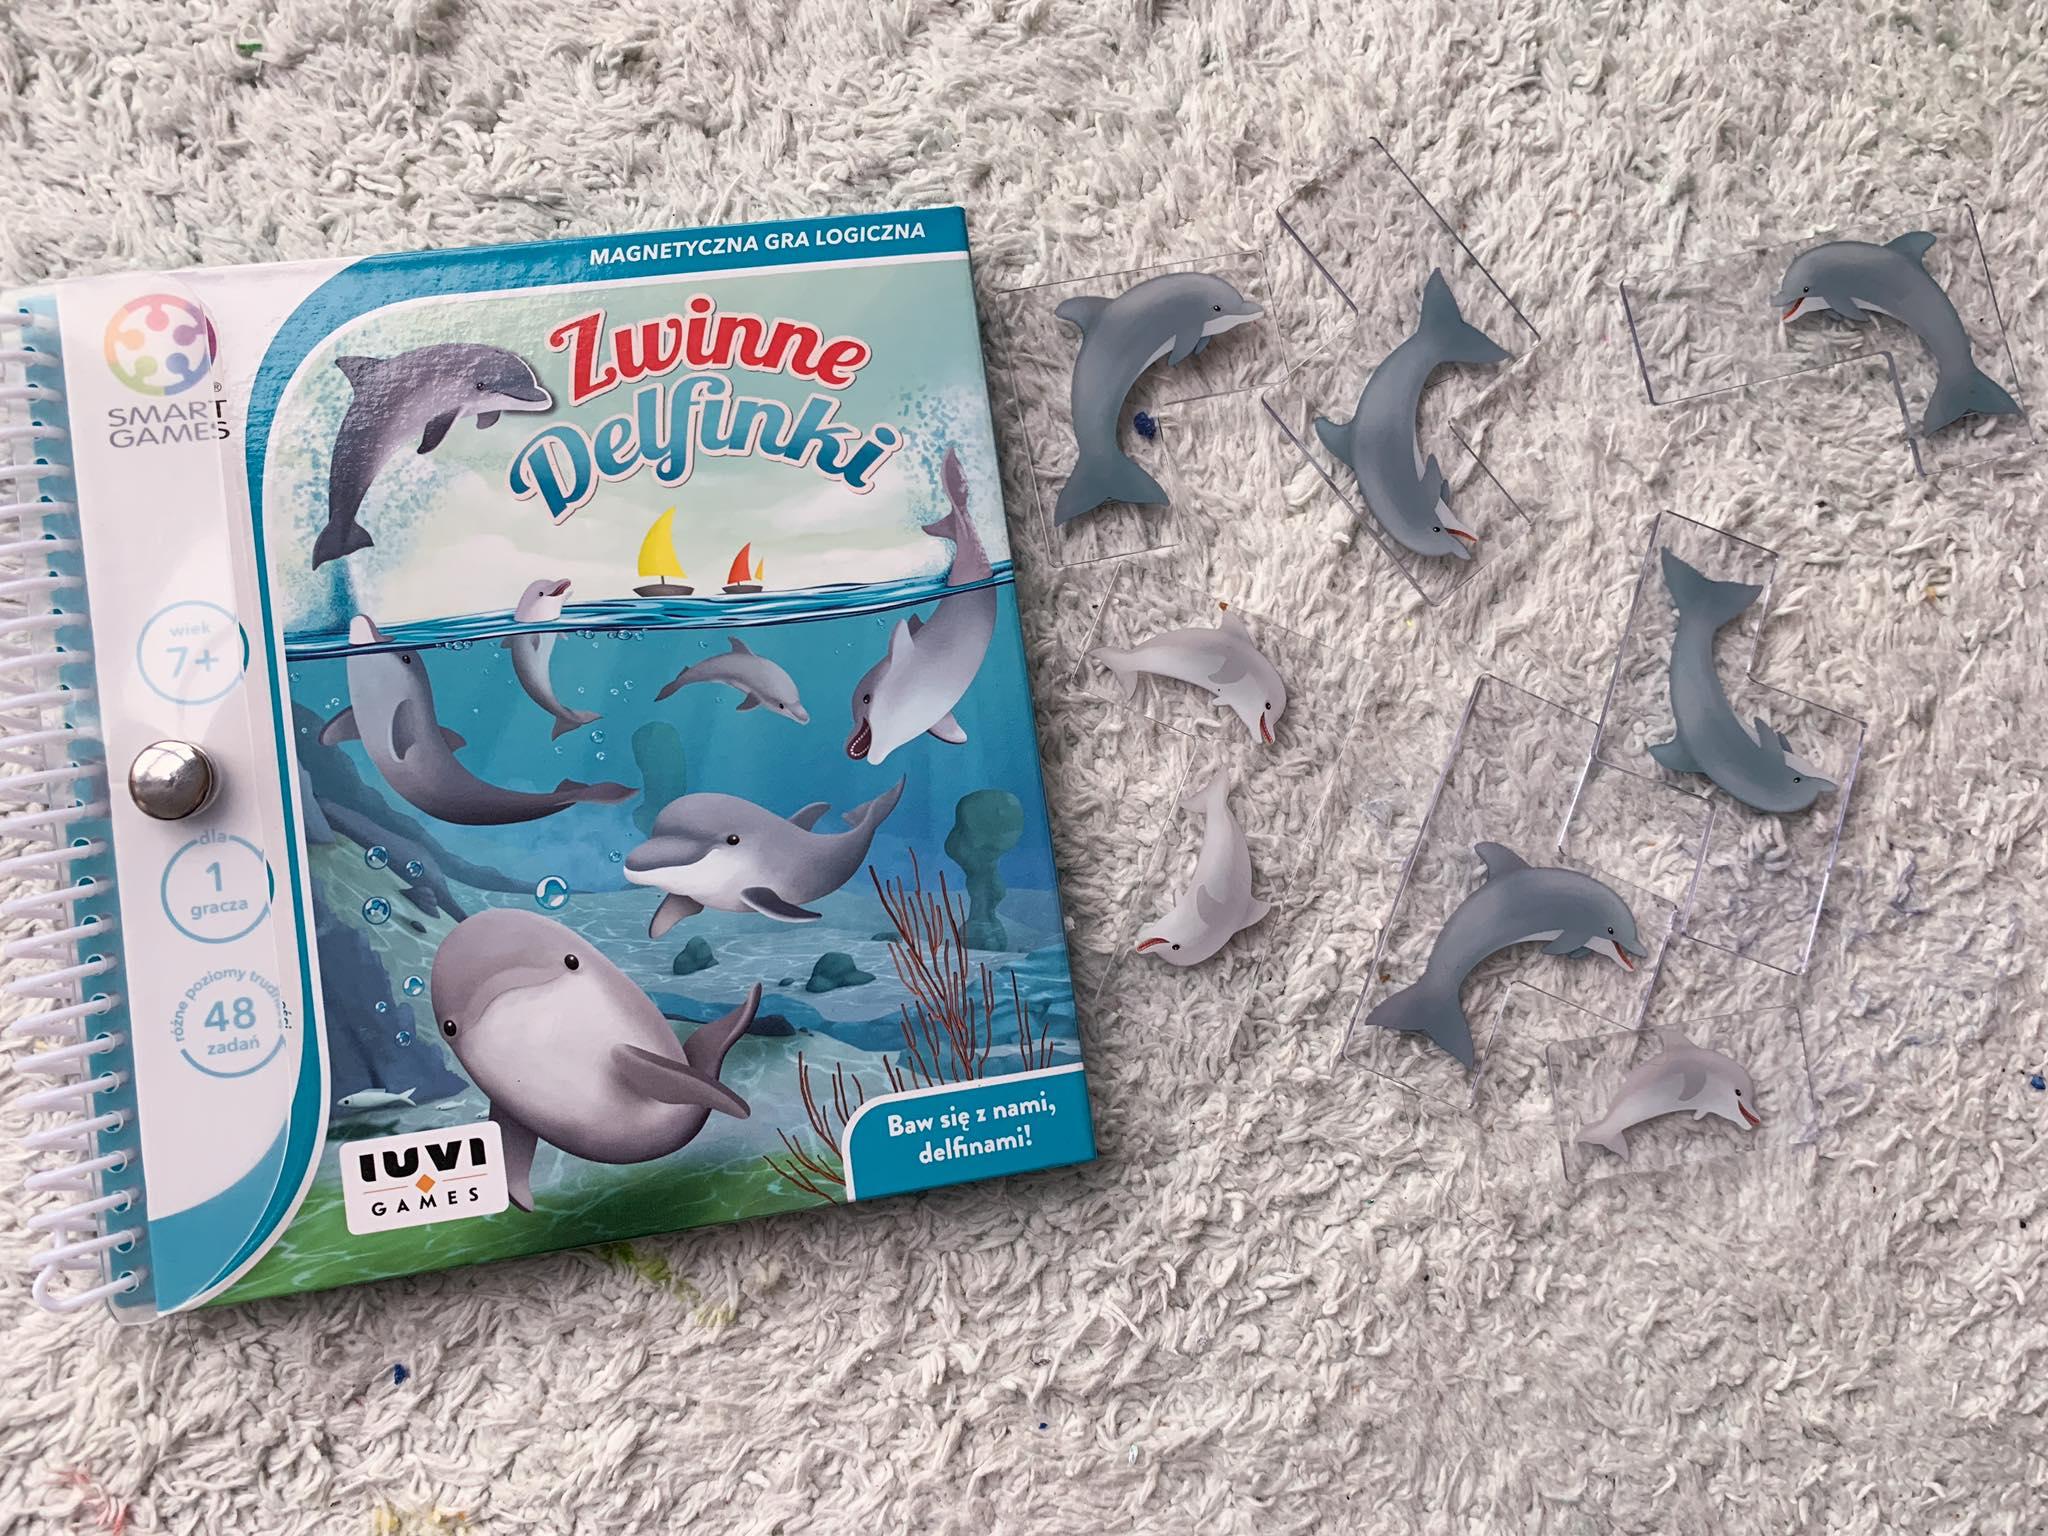 Smart Games_delfinki